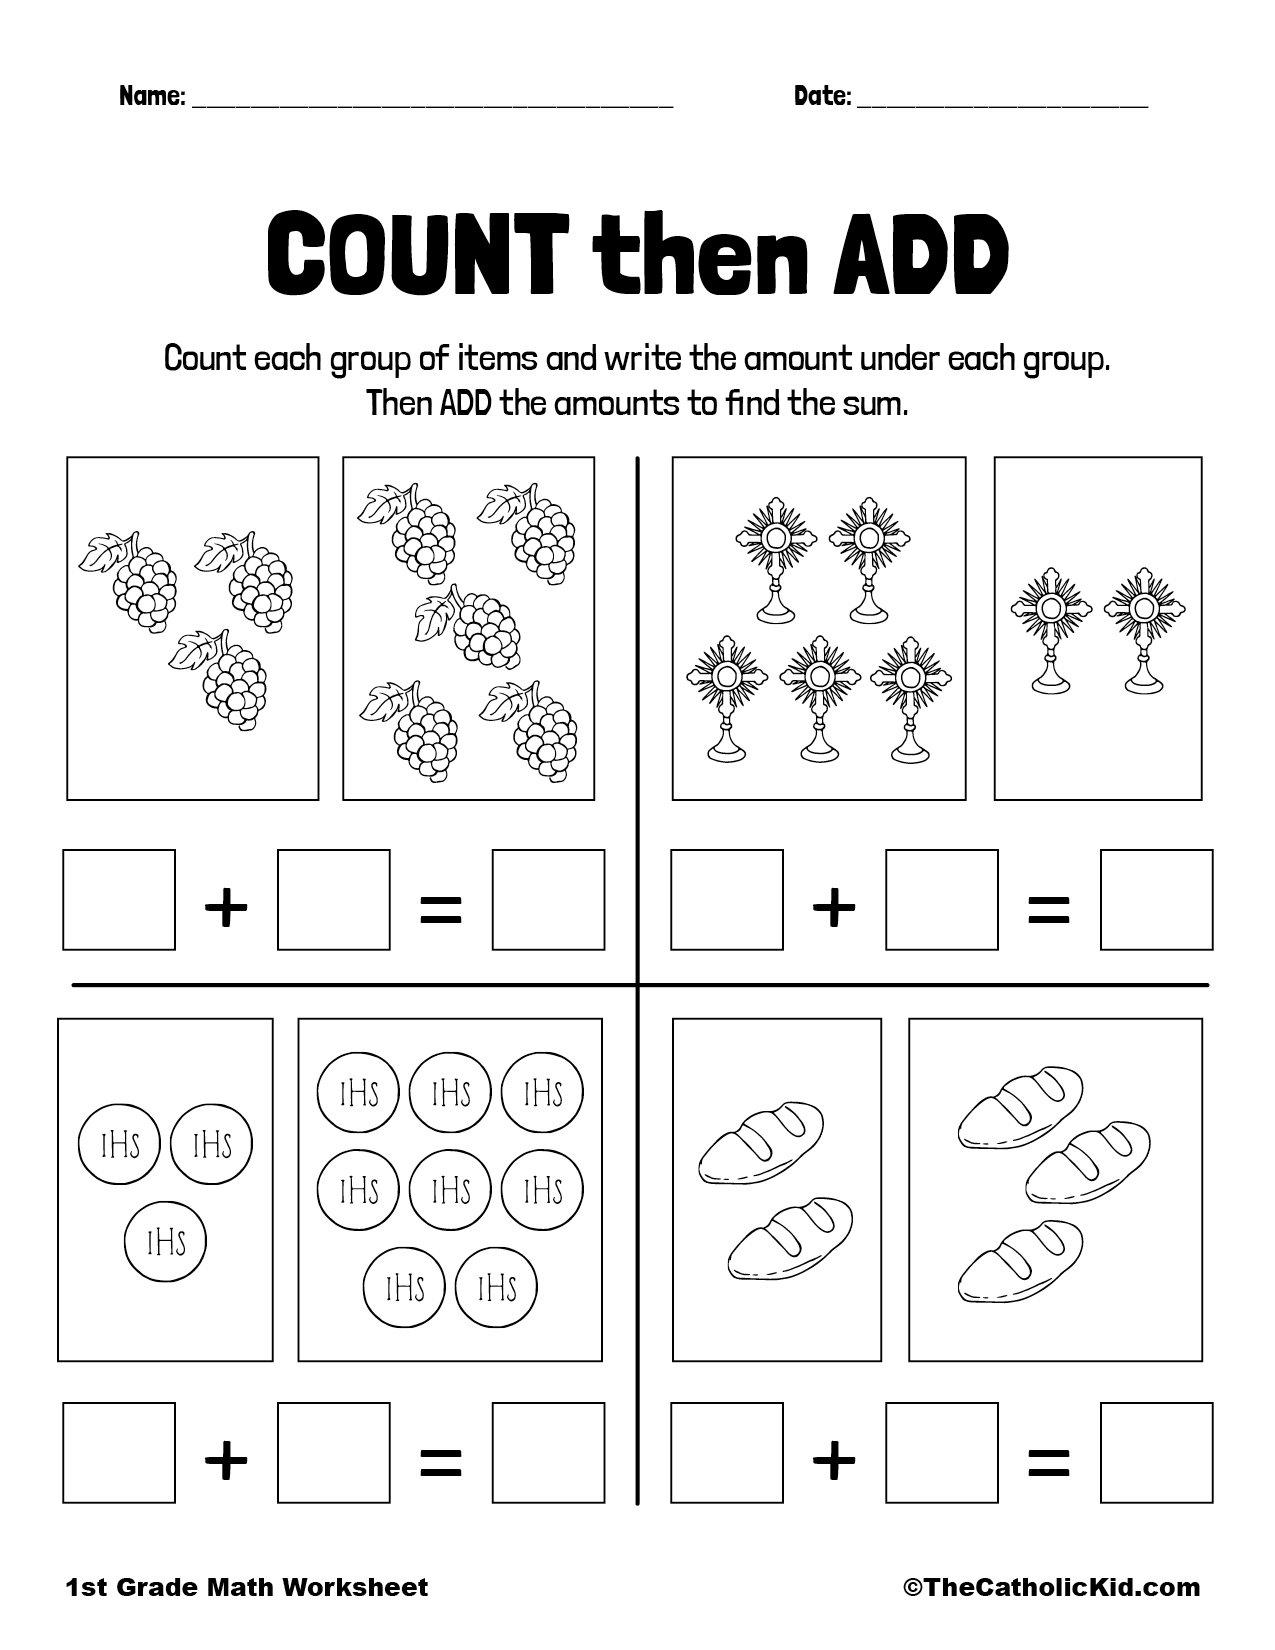 Counting and Adding - 1st Grade Math Worksheet Catholic